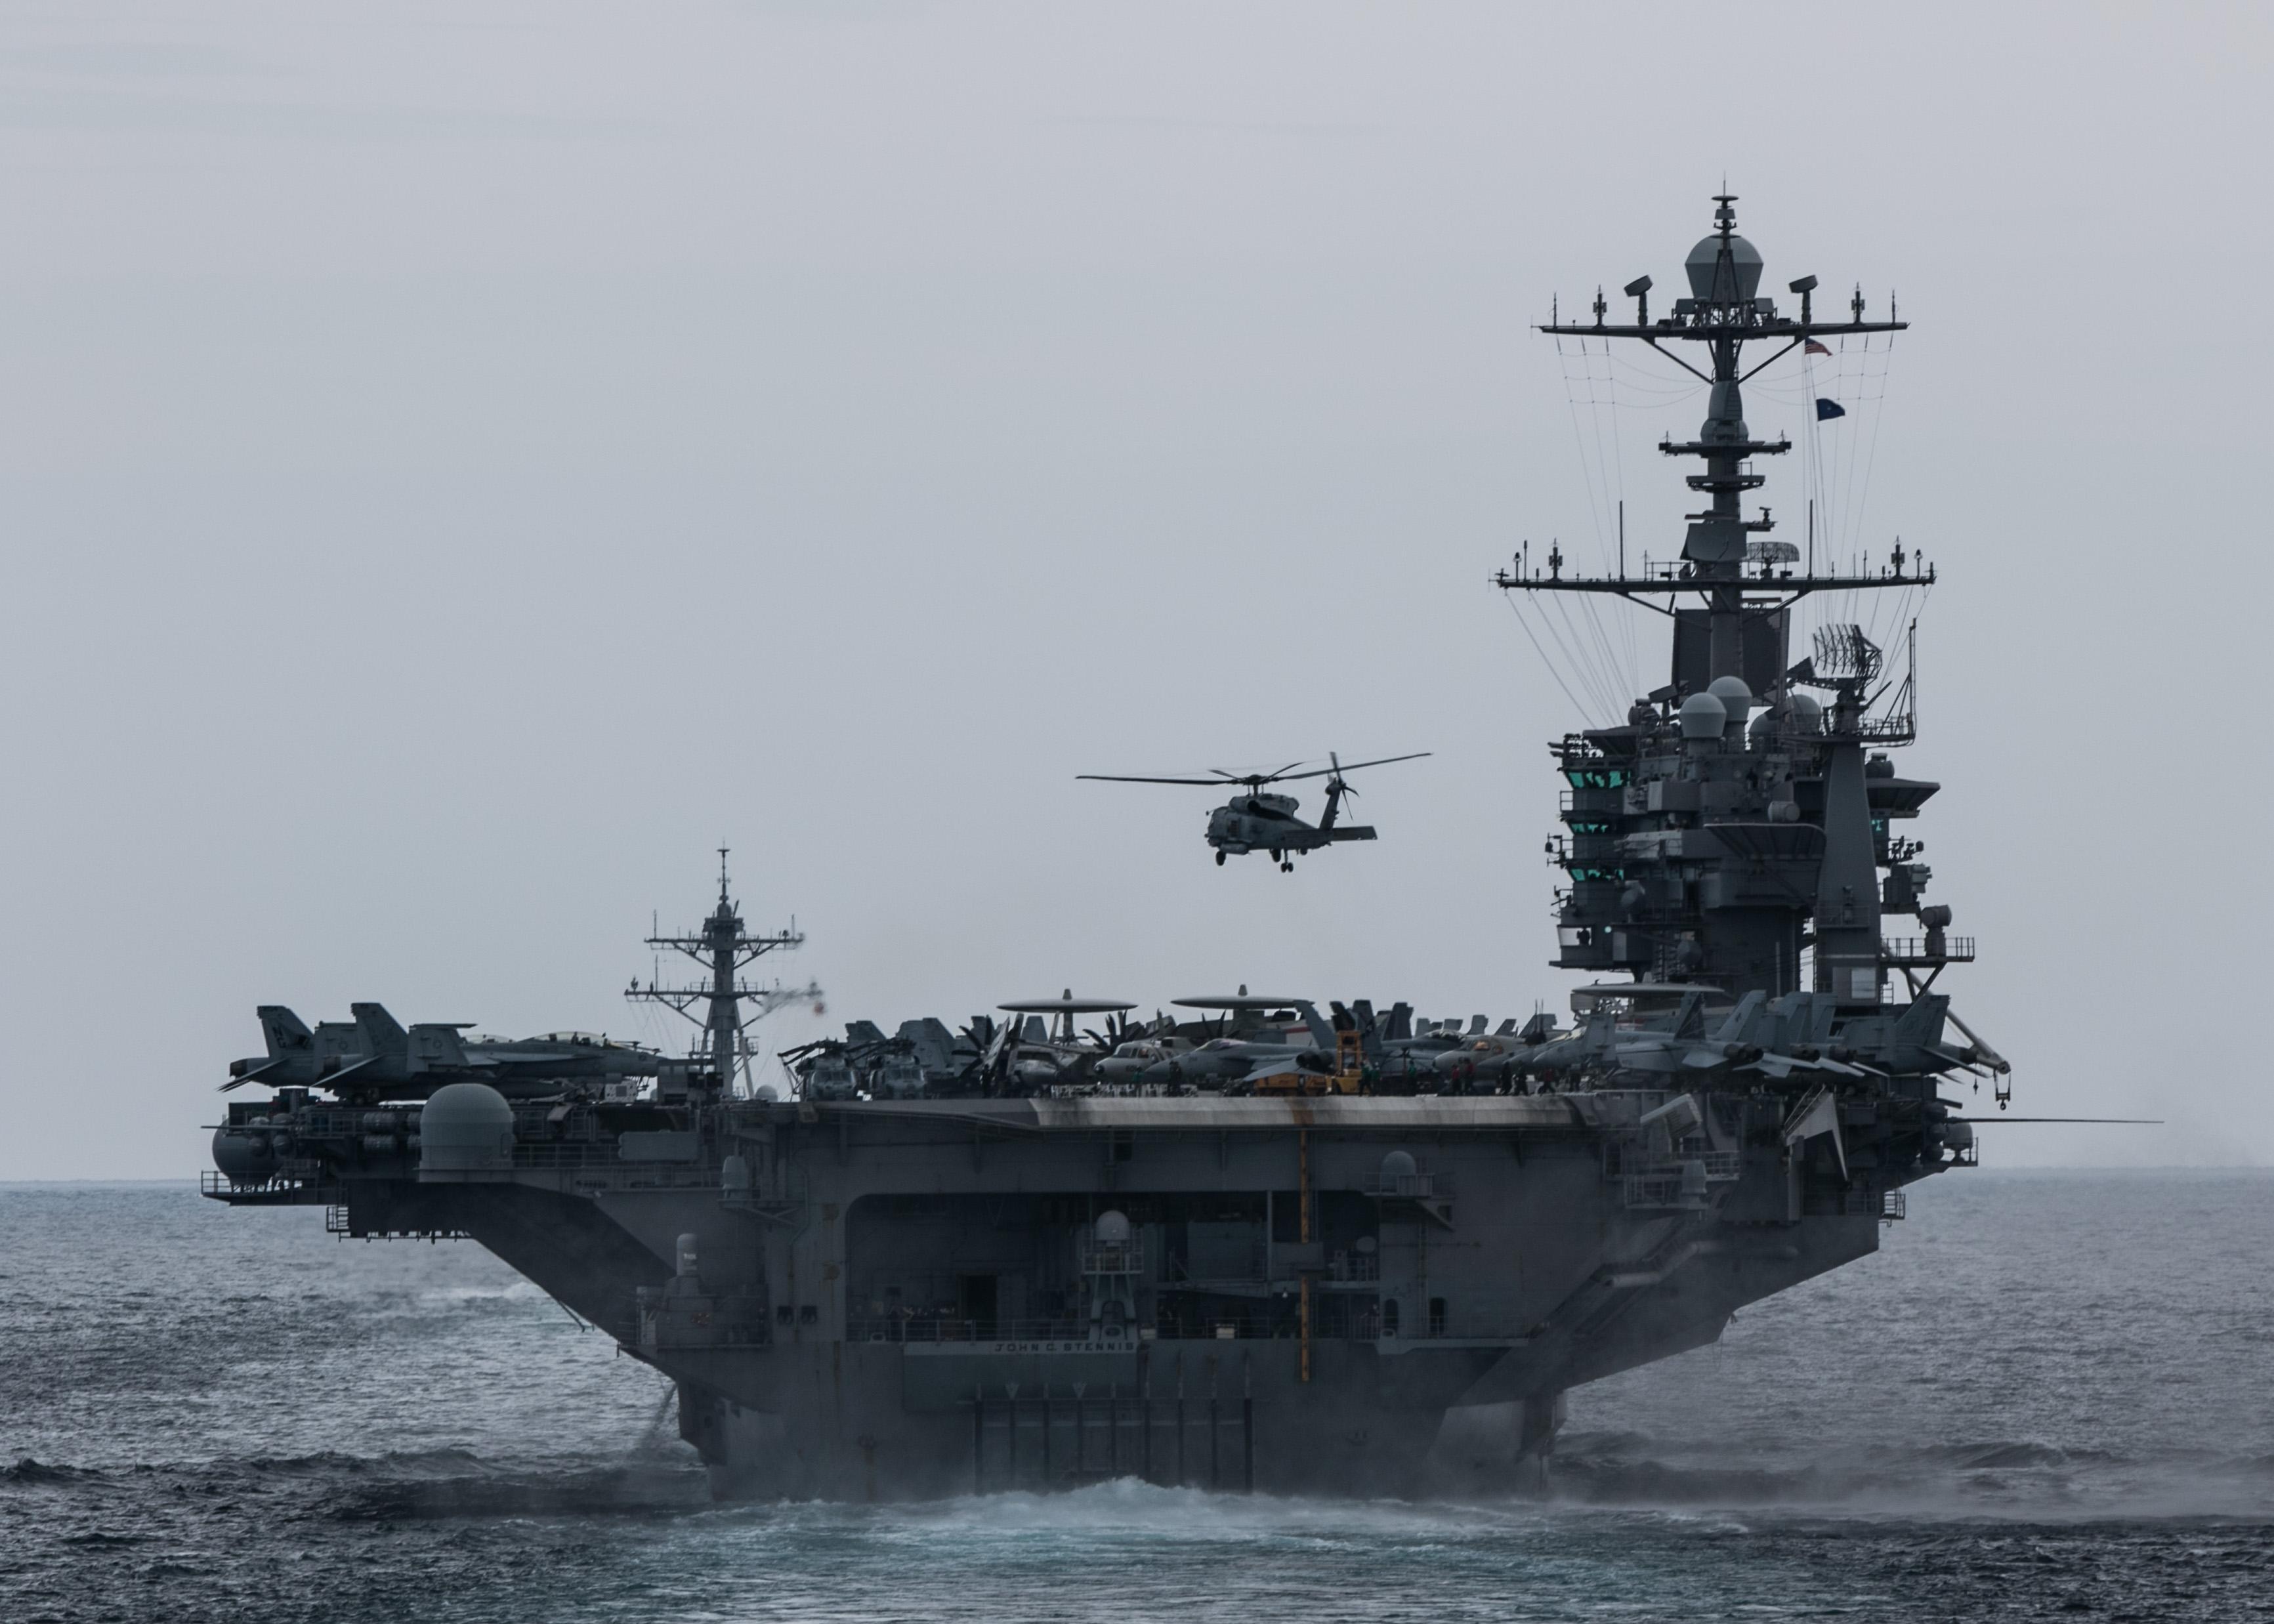 CV & CVN : Aircraft Carriers - Porte-avions - Page 27 46956621622_c5f47f9b2a_o